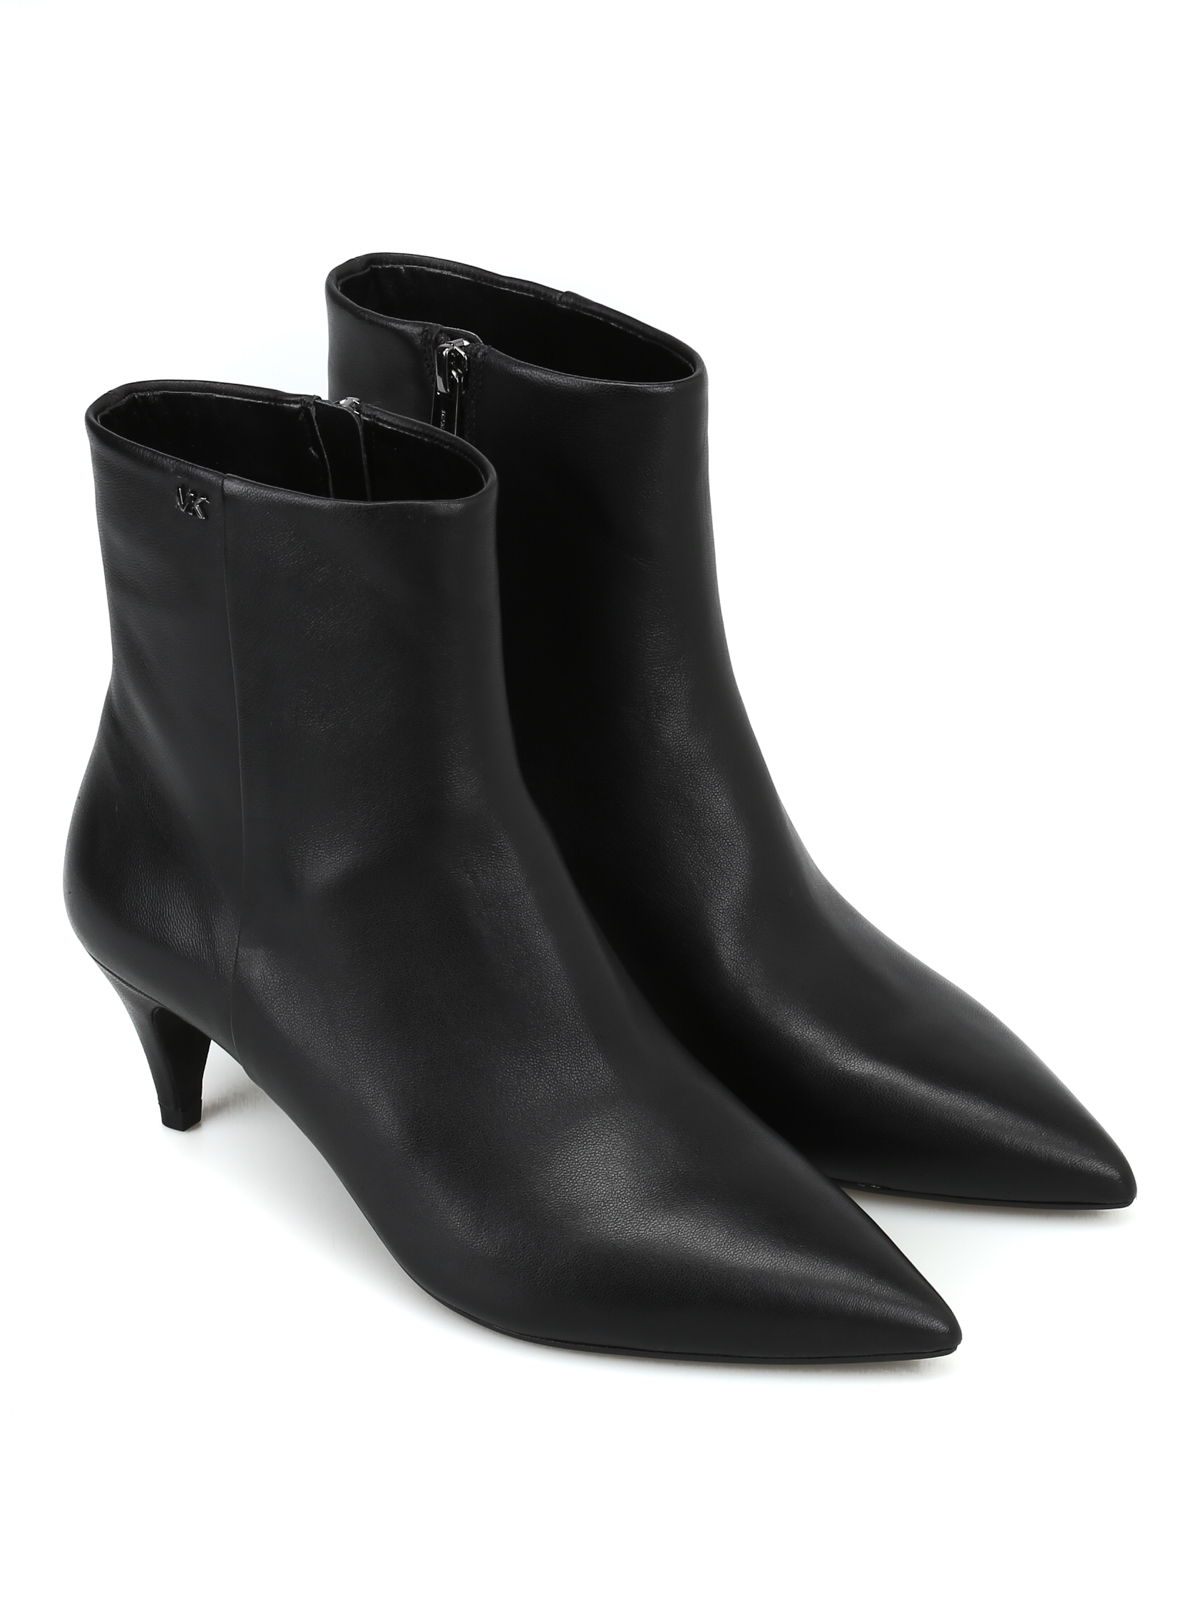 Blaine Flex black leather kitten bootie